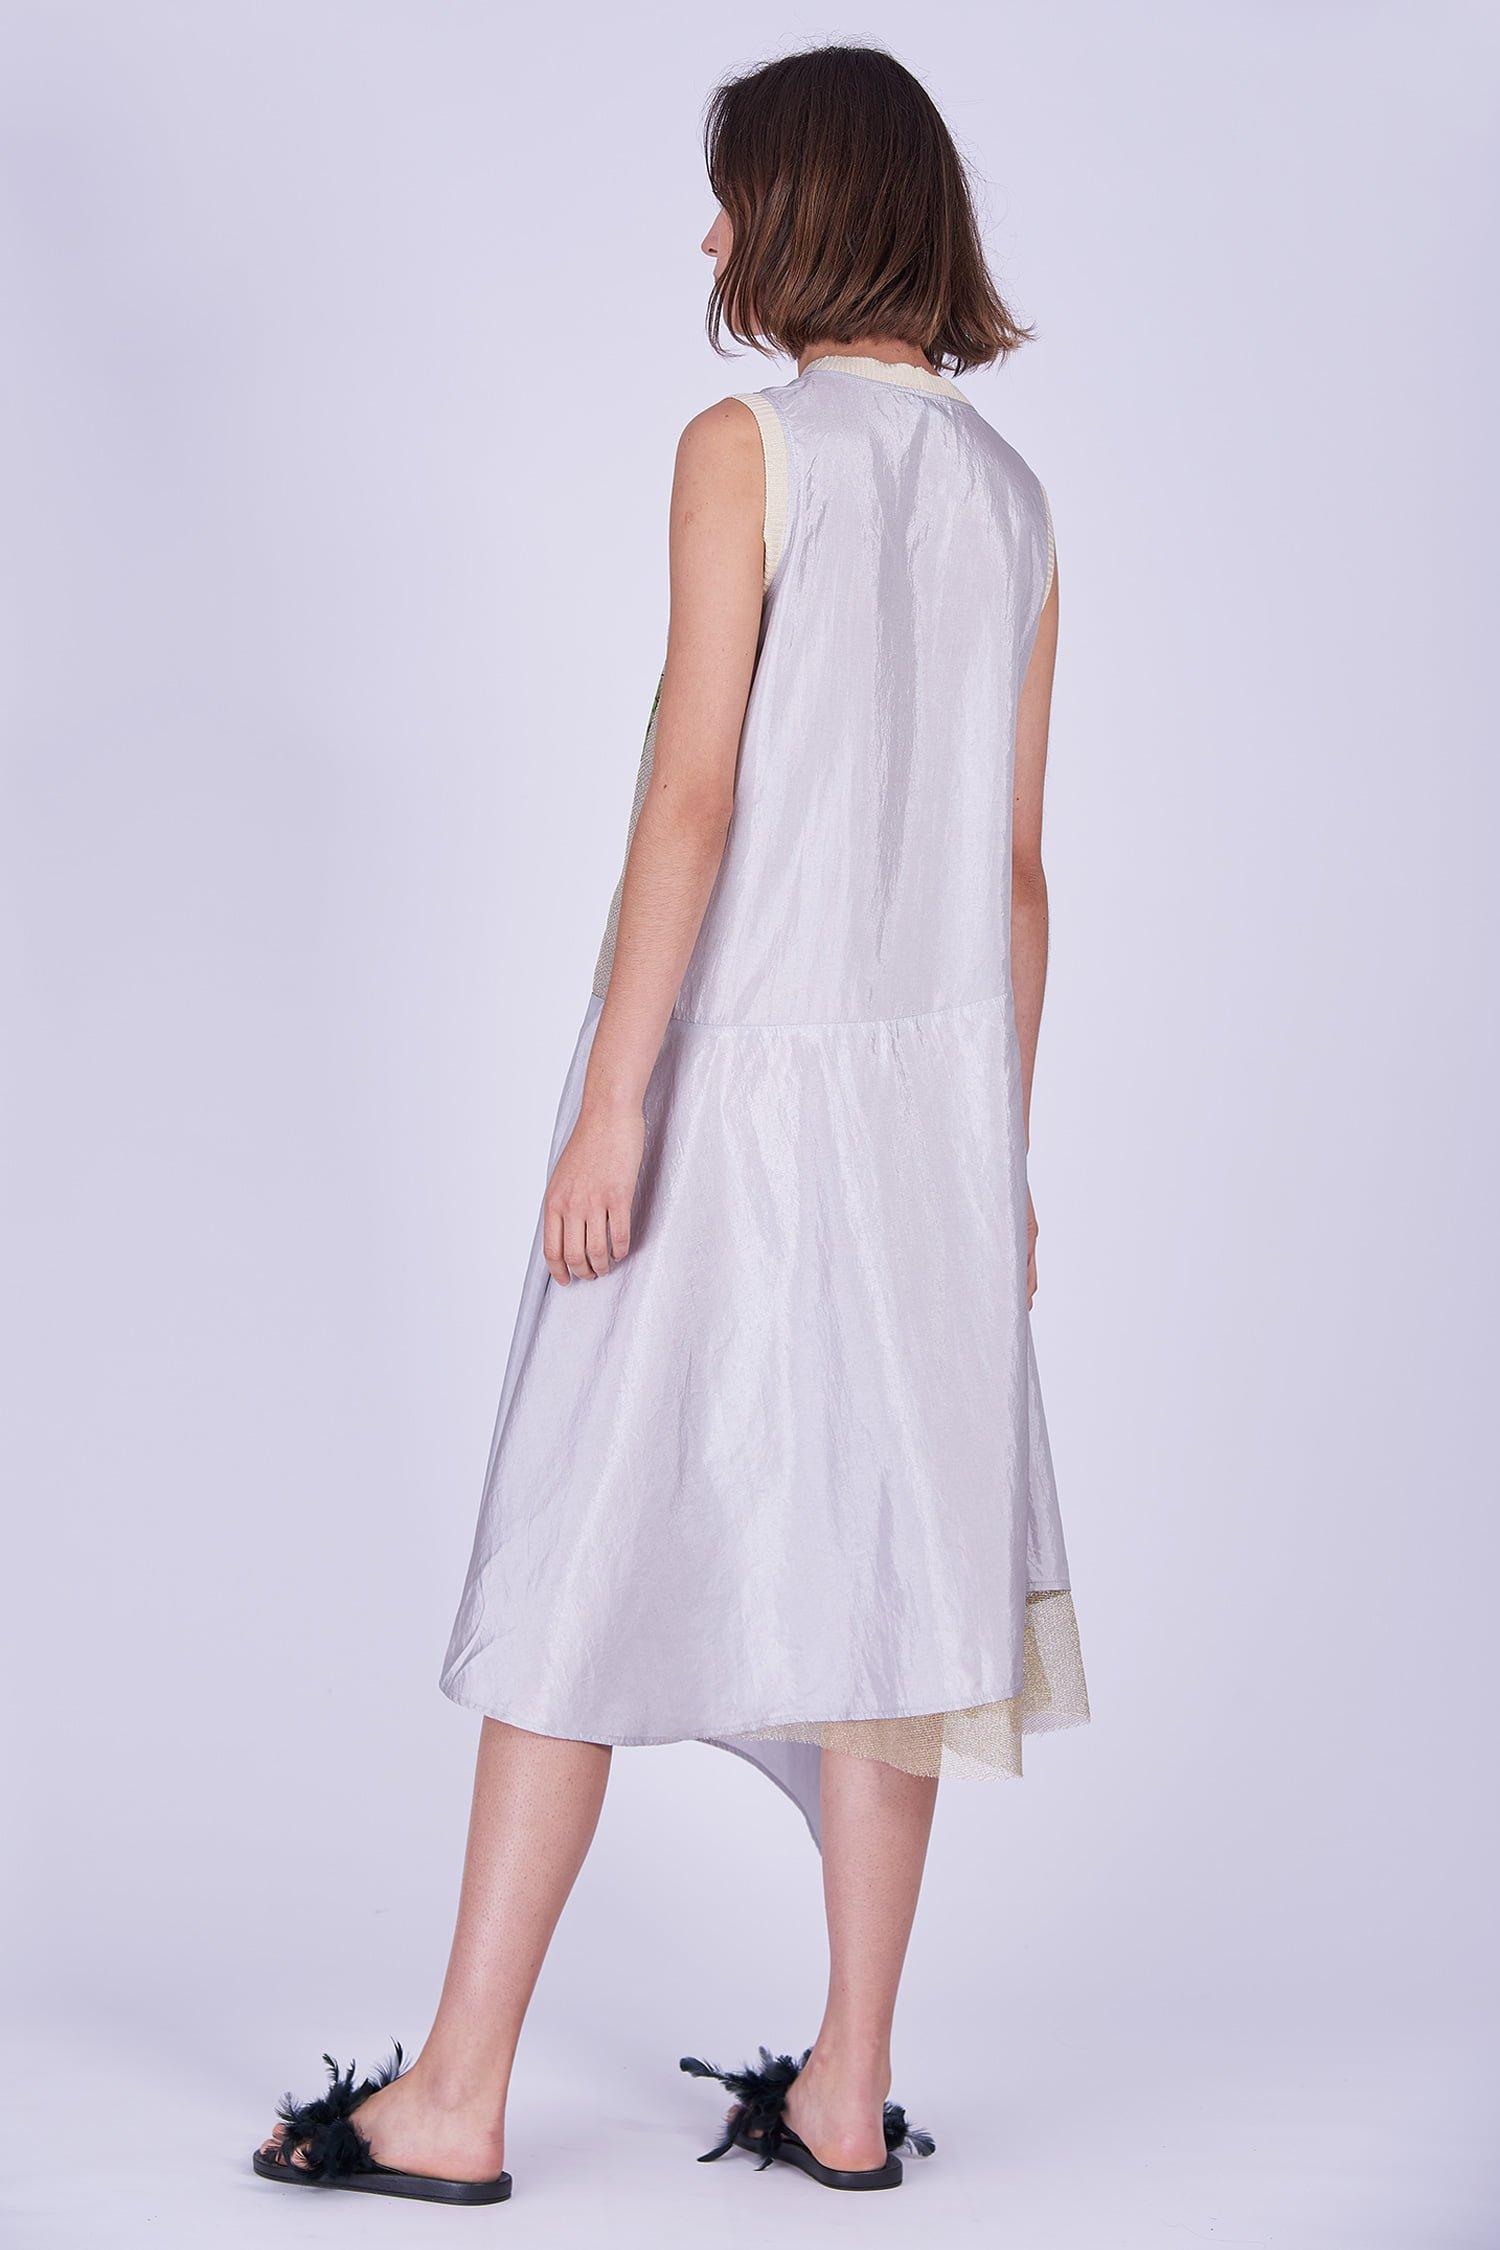 Acephala Ss2020 Sleeveless Summer Dress Letnia Sukienka Back Side 2